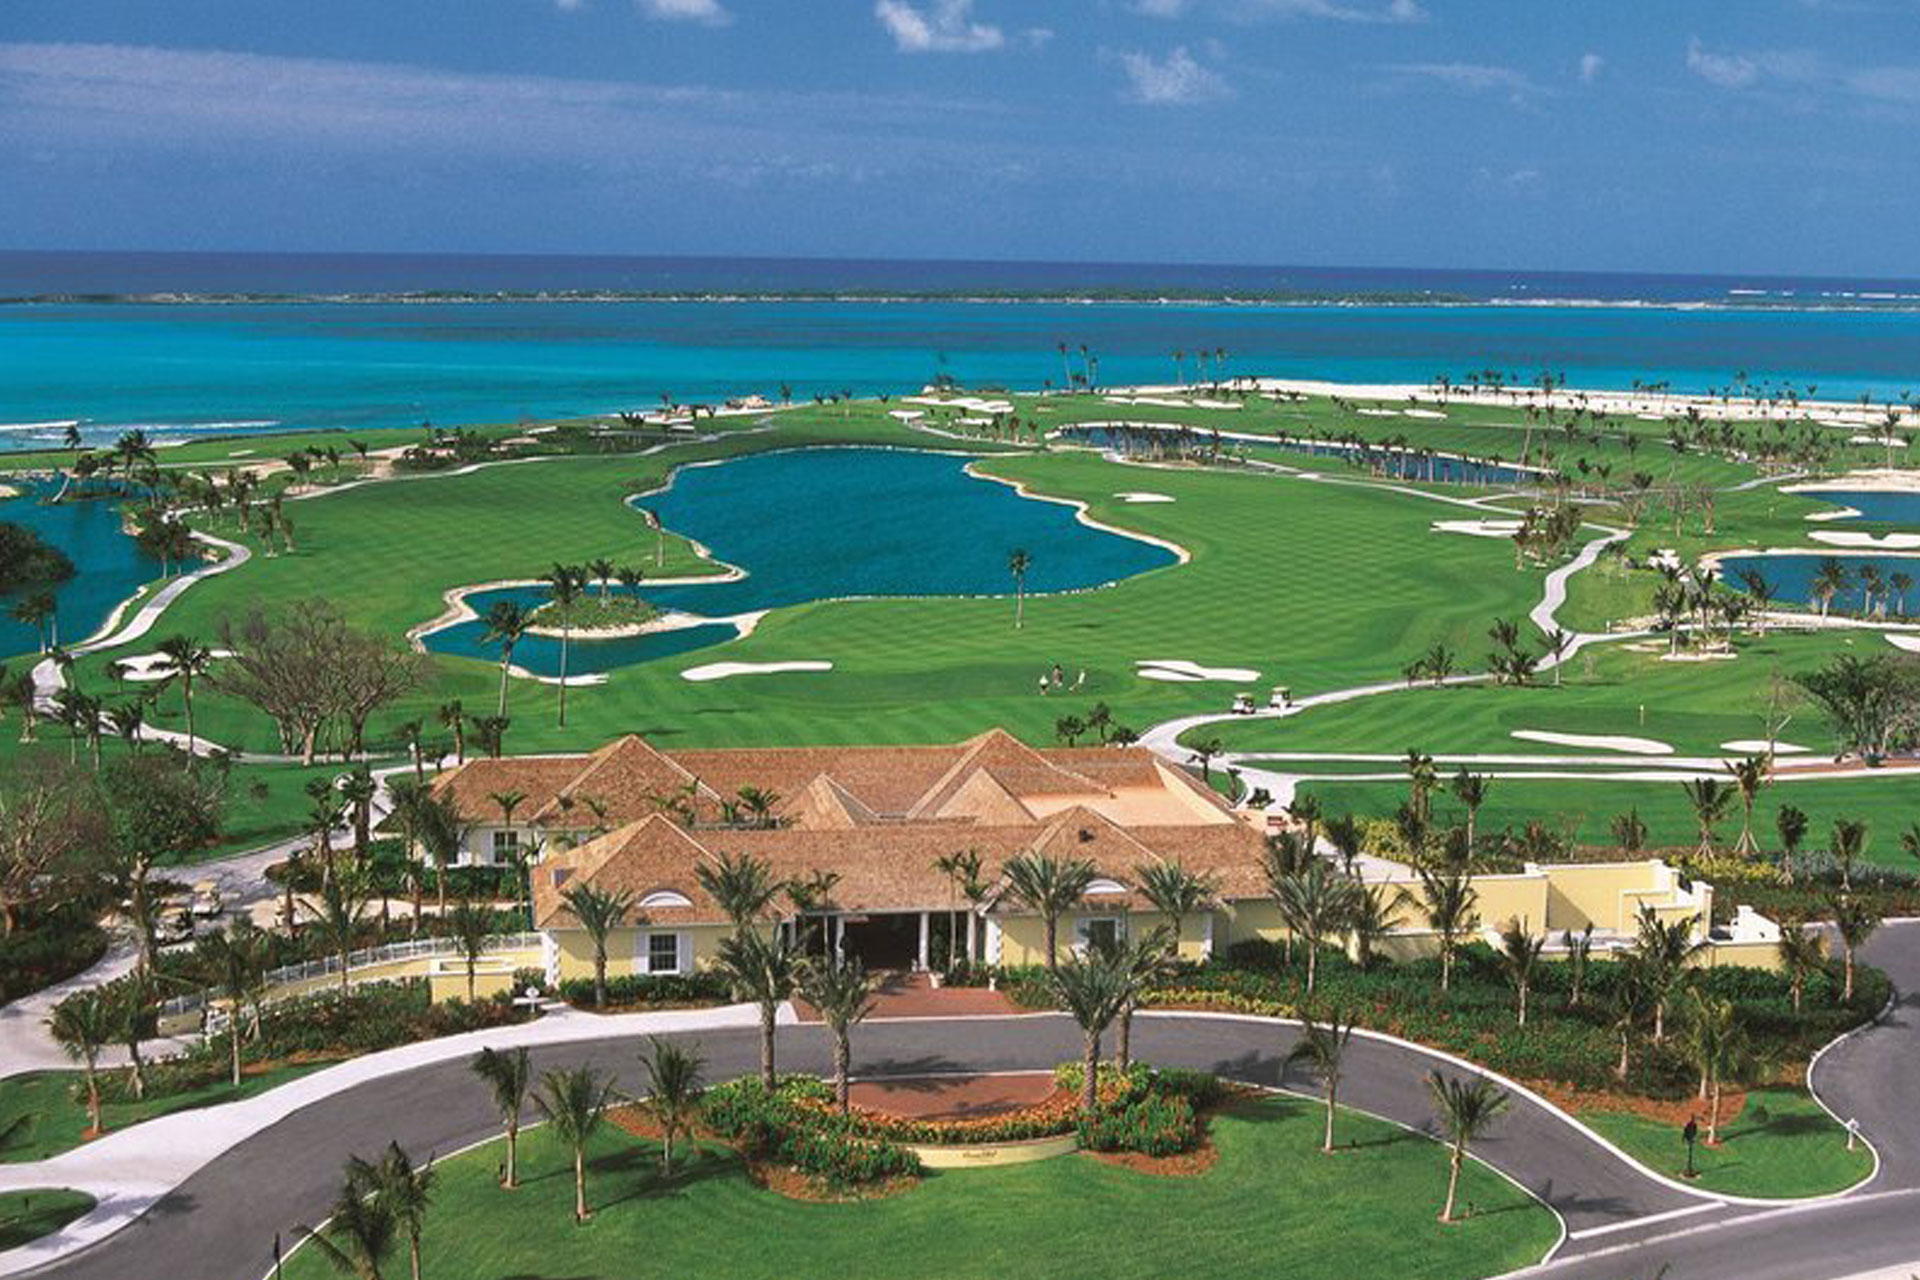 Atlantis Golf; Courtesy of Atlantis Resort